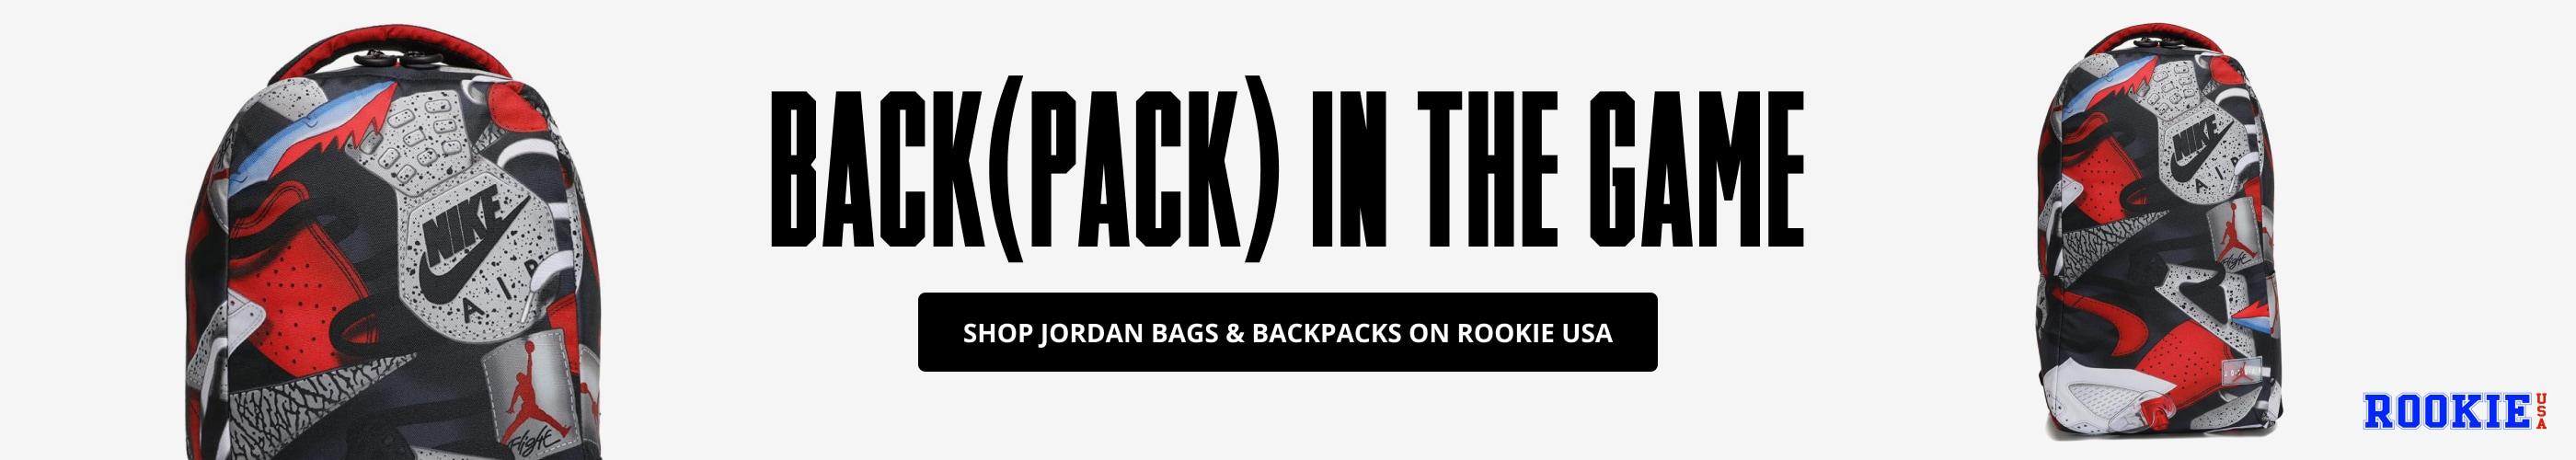 Shop Jordan Bags & Backpacks on Rookie USA